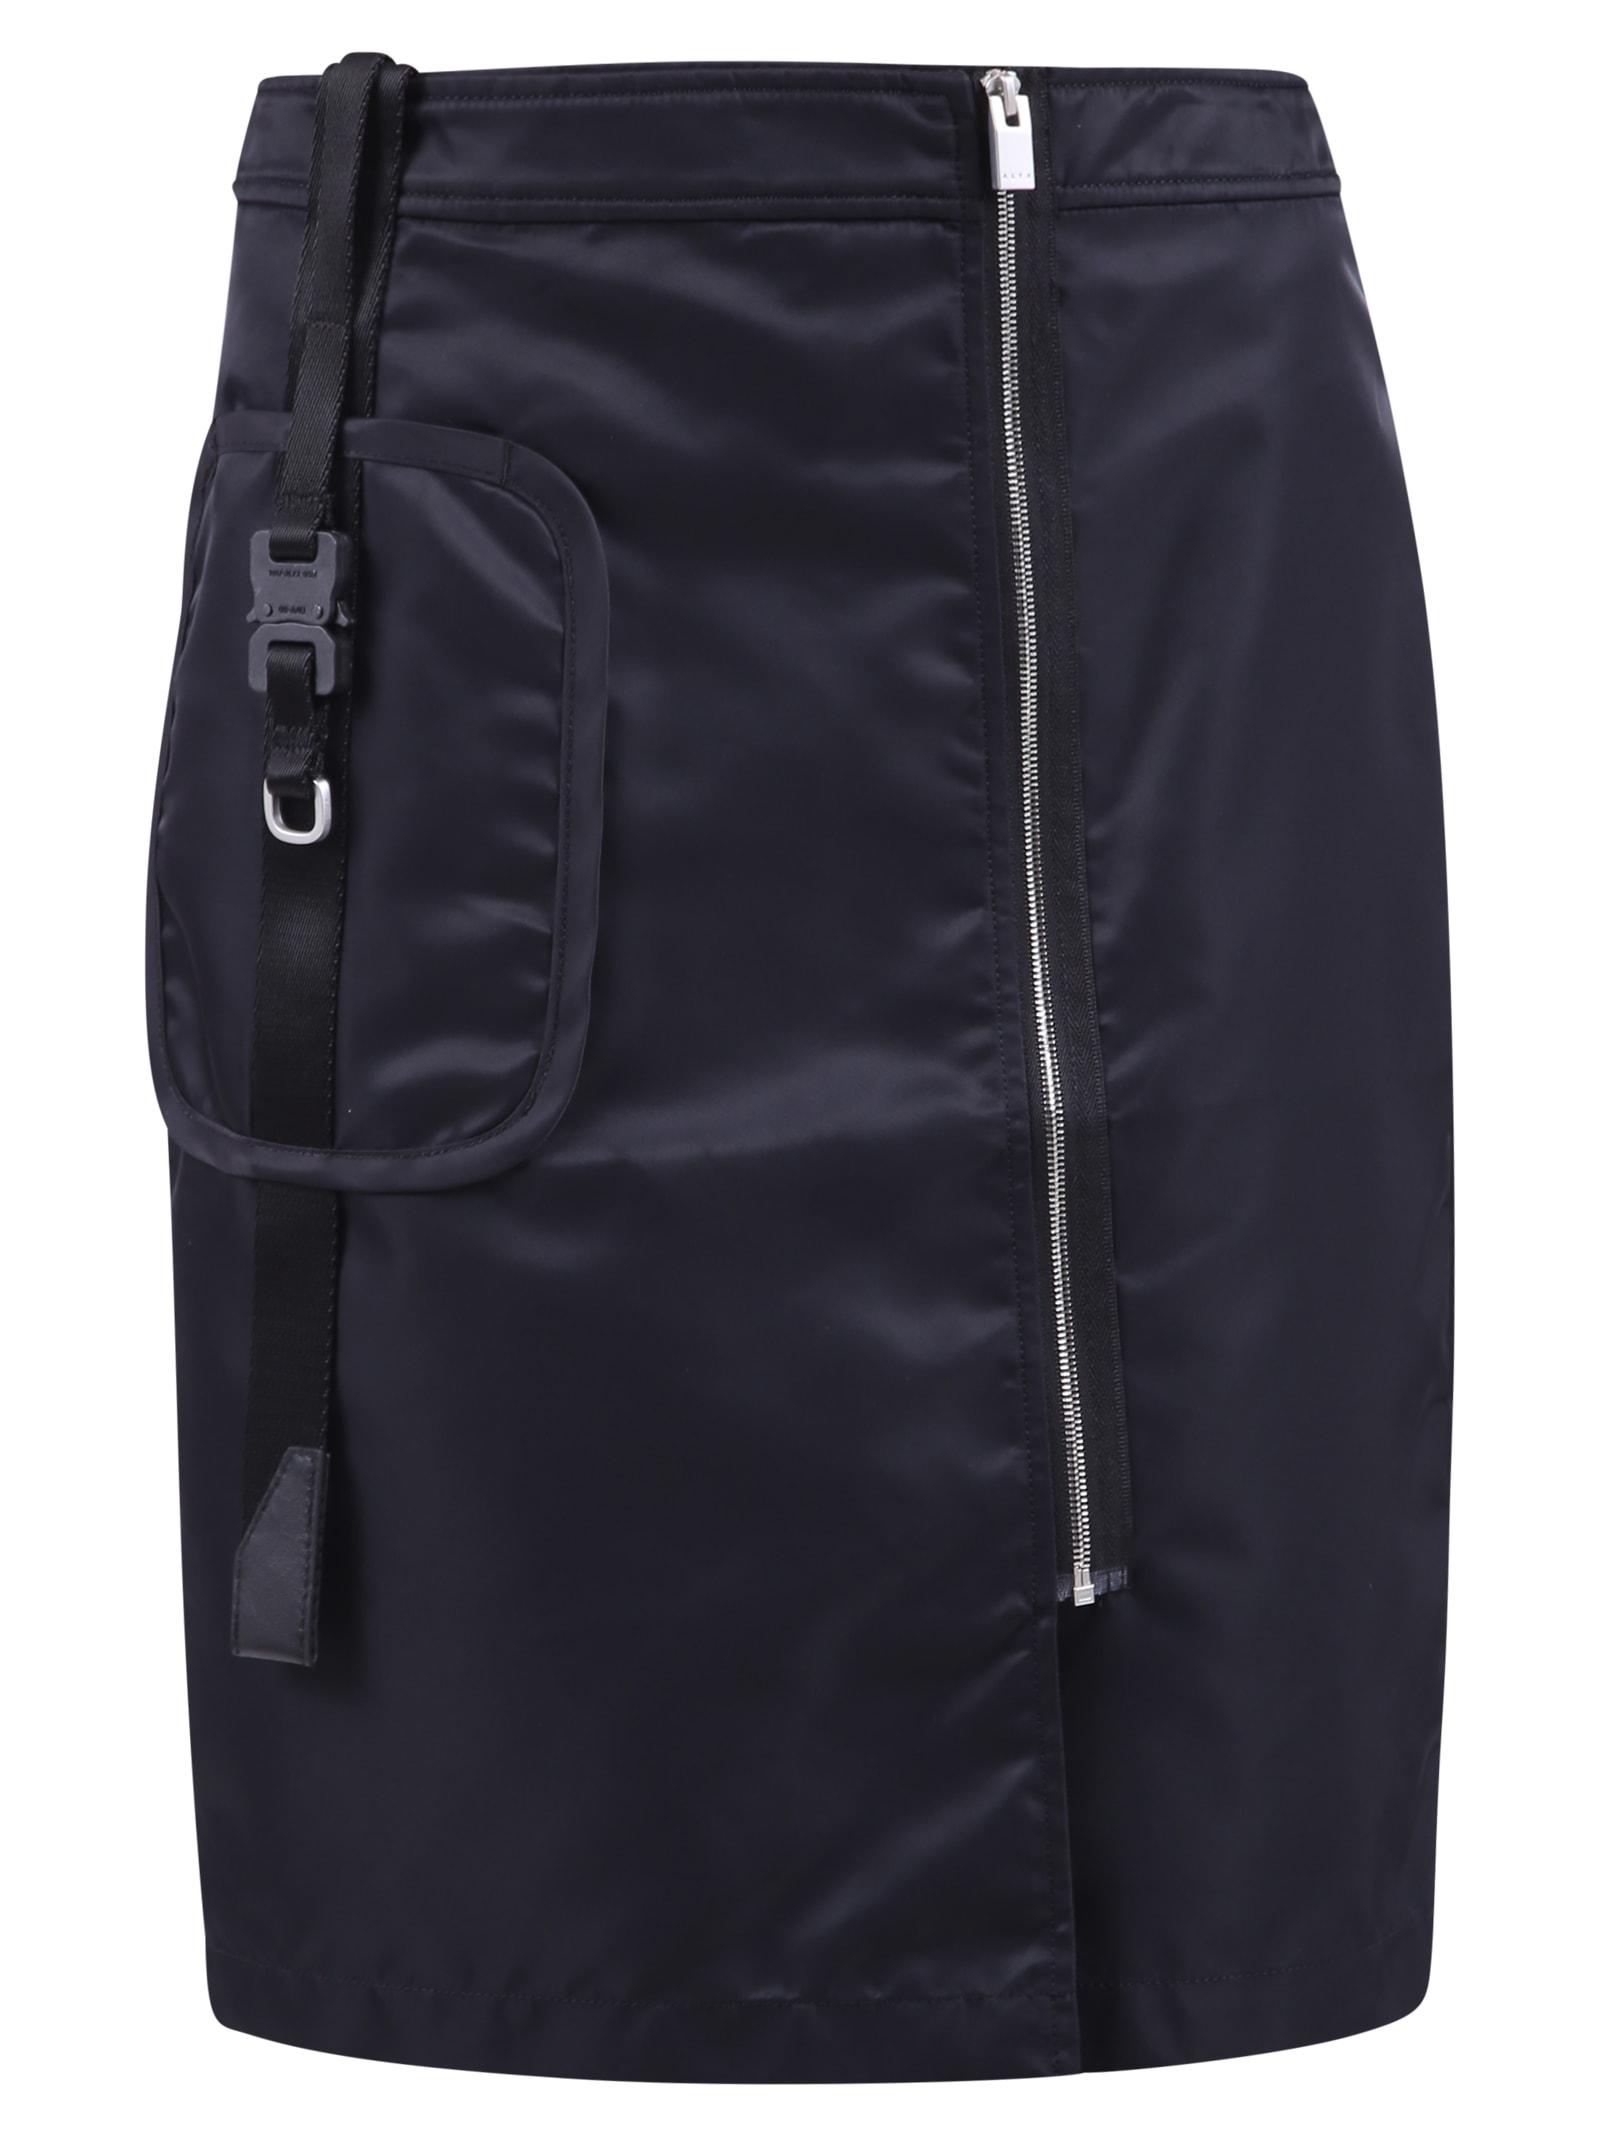 1017 ALYX 9SM Zipped Skirt